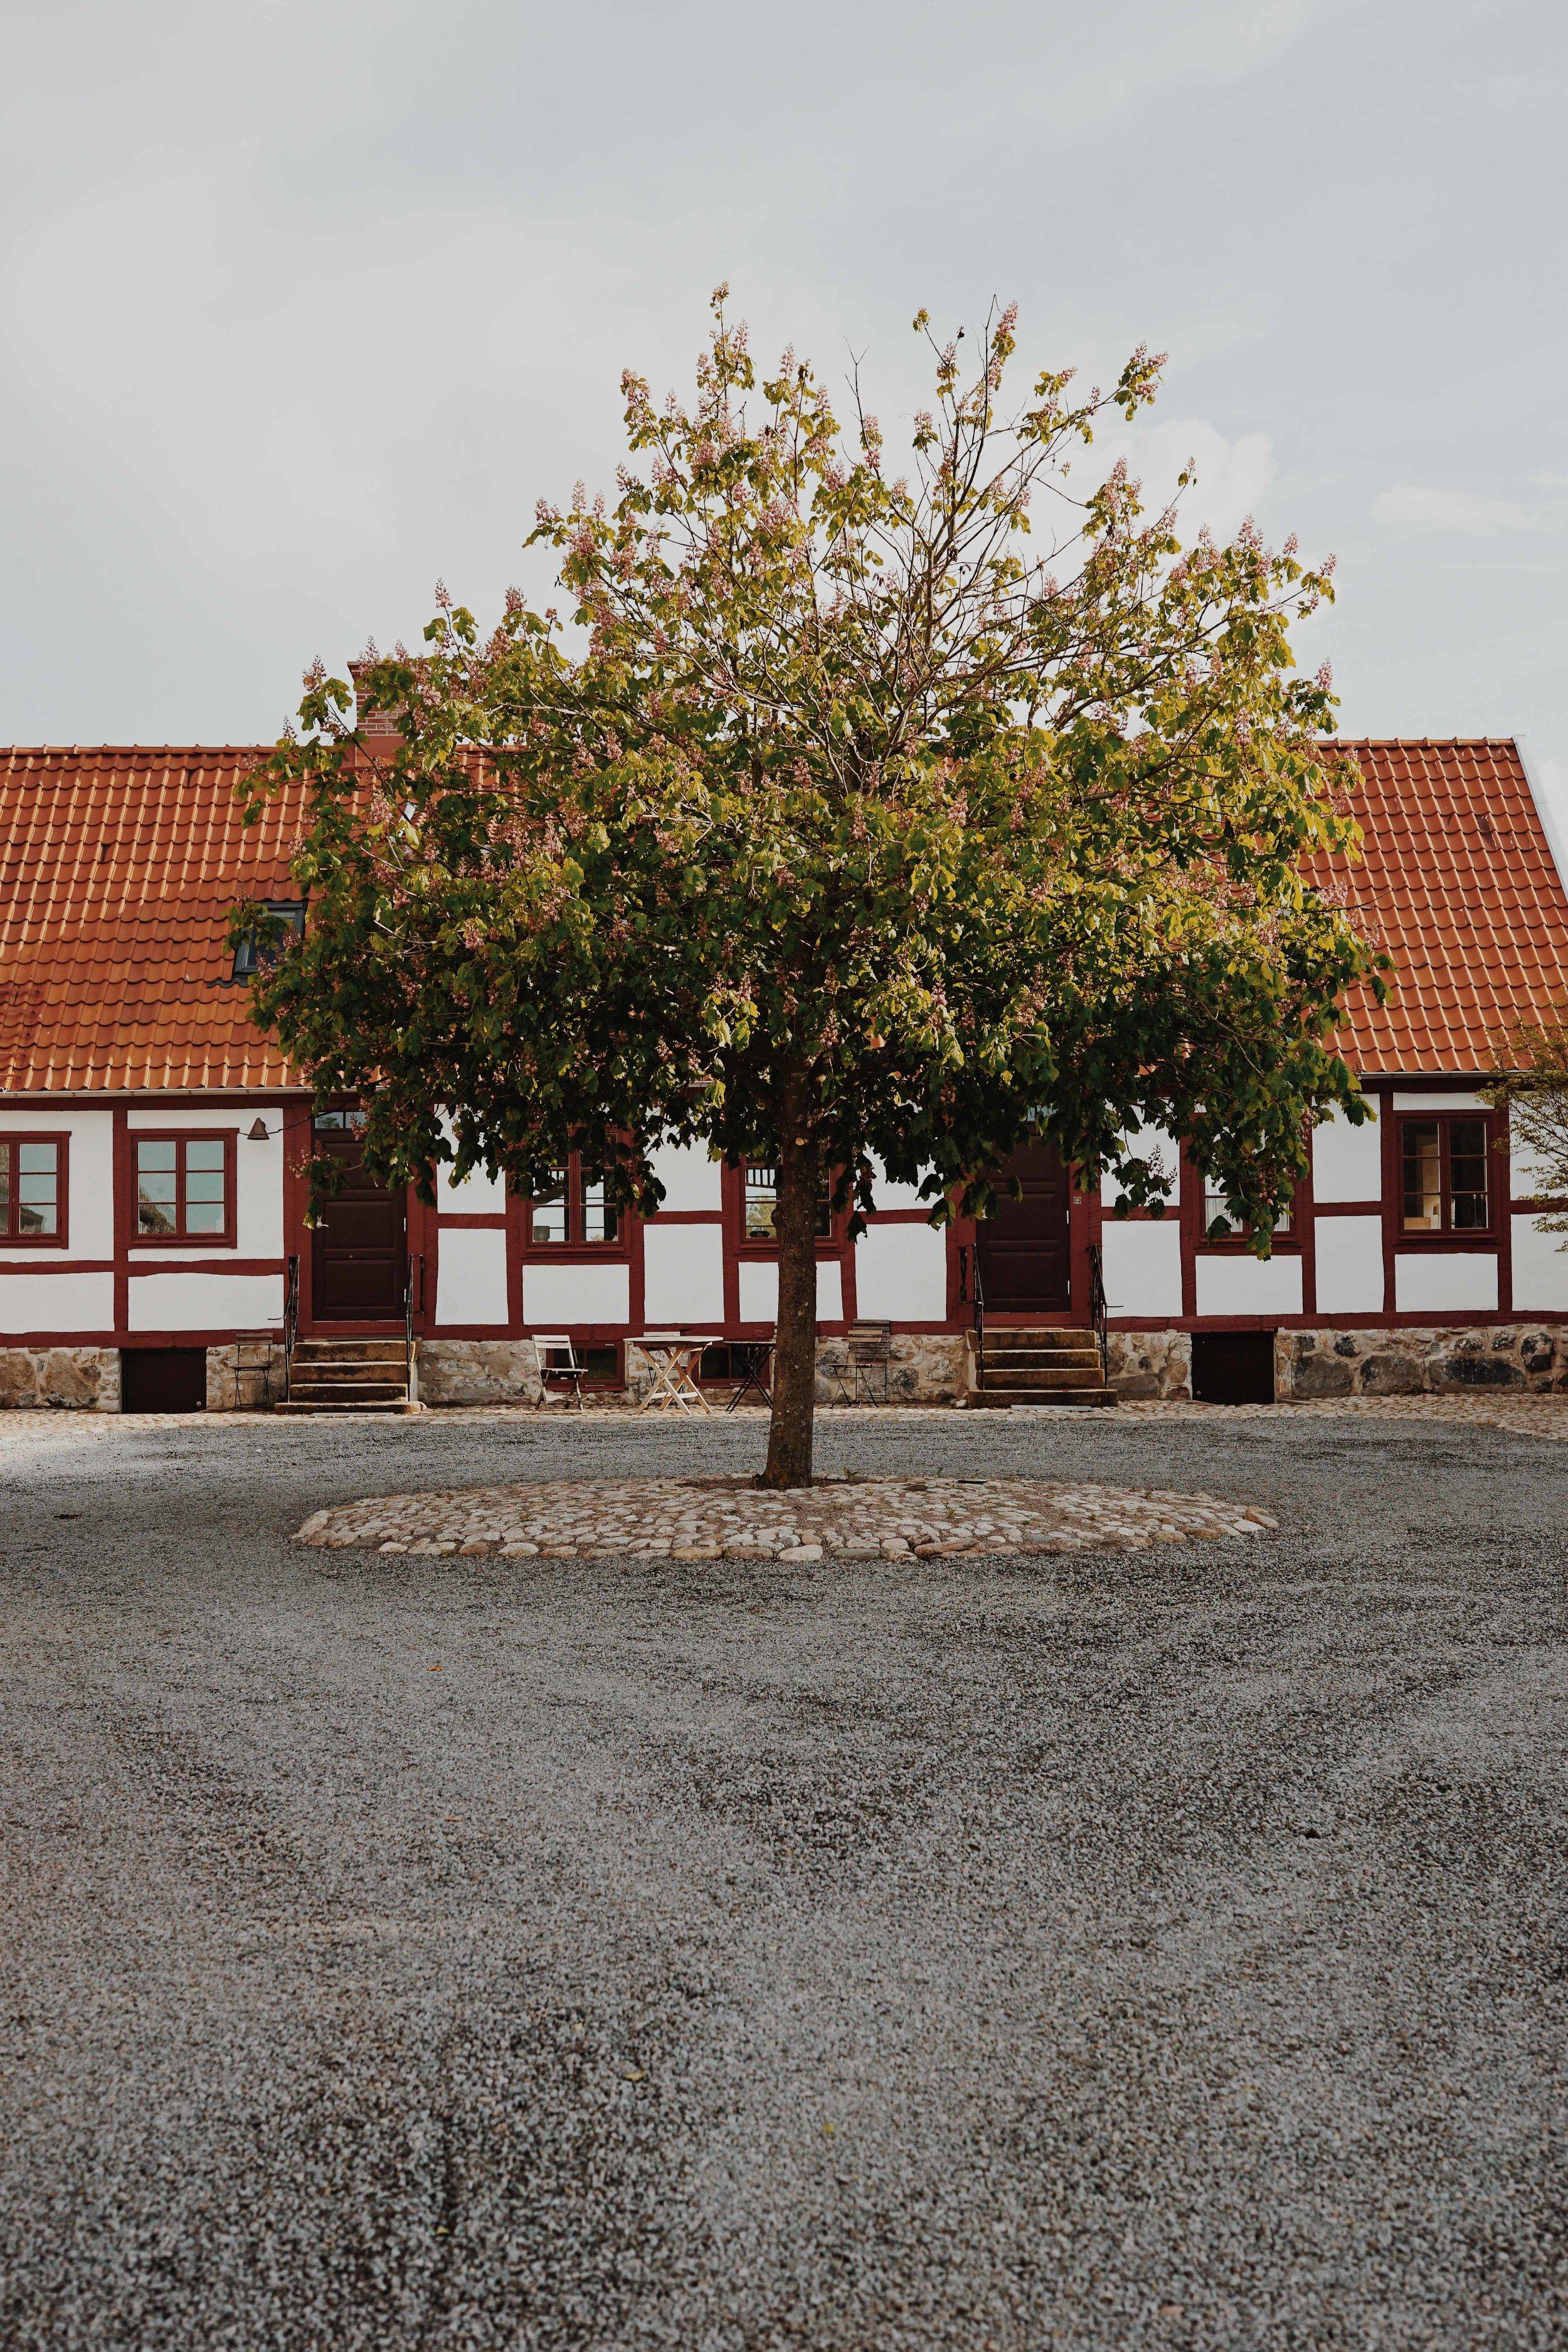 ASROSENVINGE_VisitSkane_Kullabergs_Vingard_Vineyard_LowRes-252.jpg